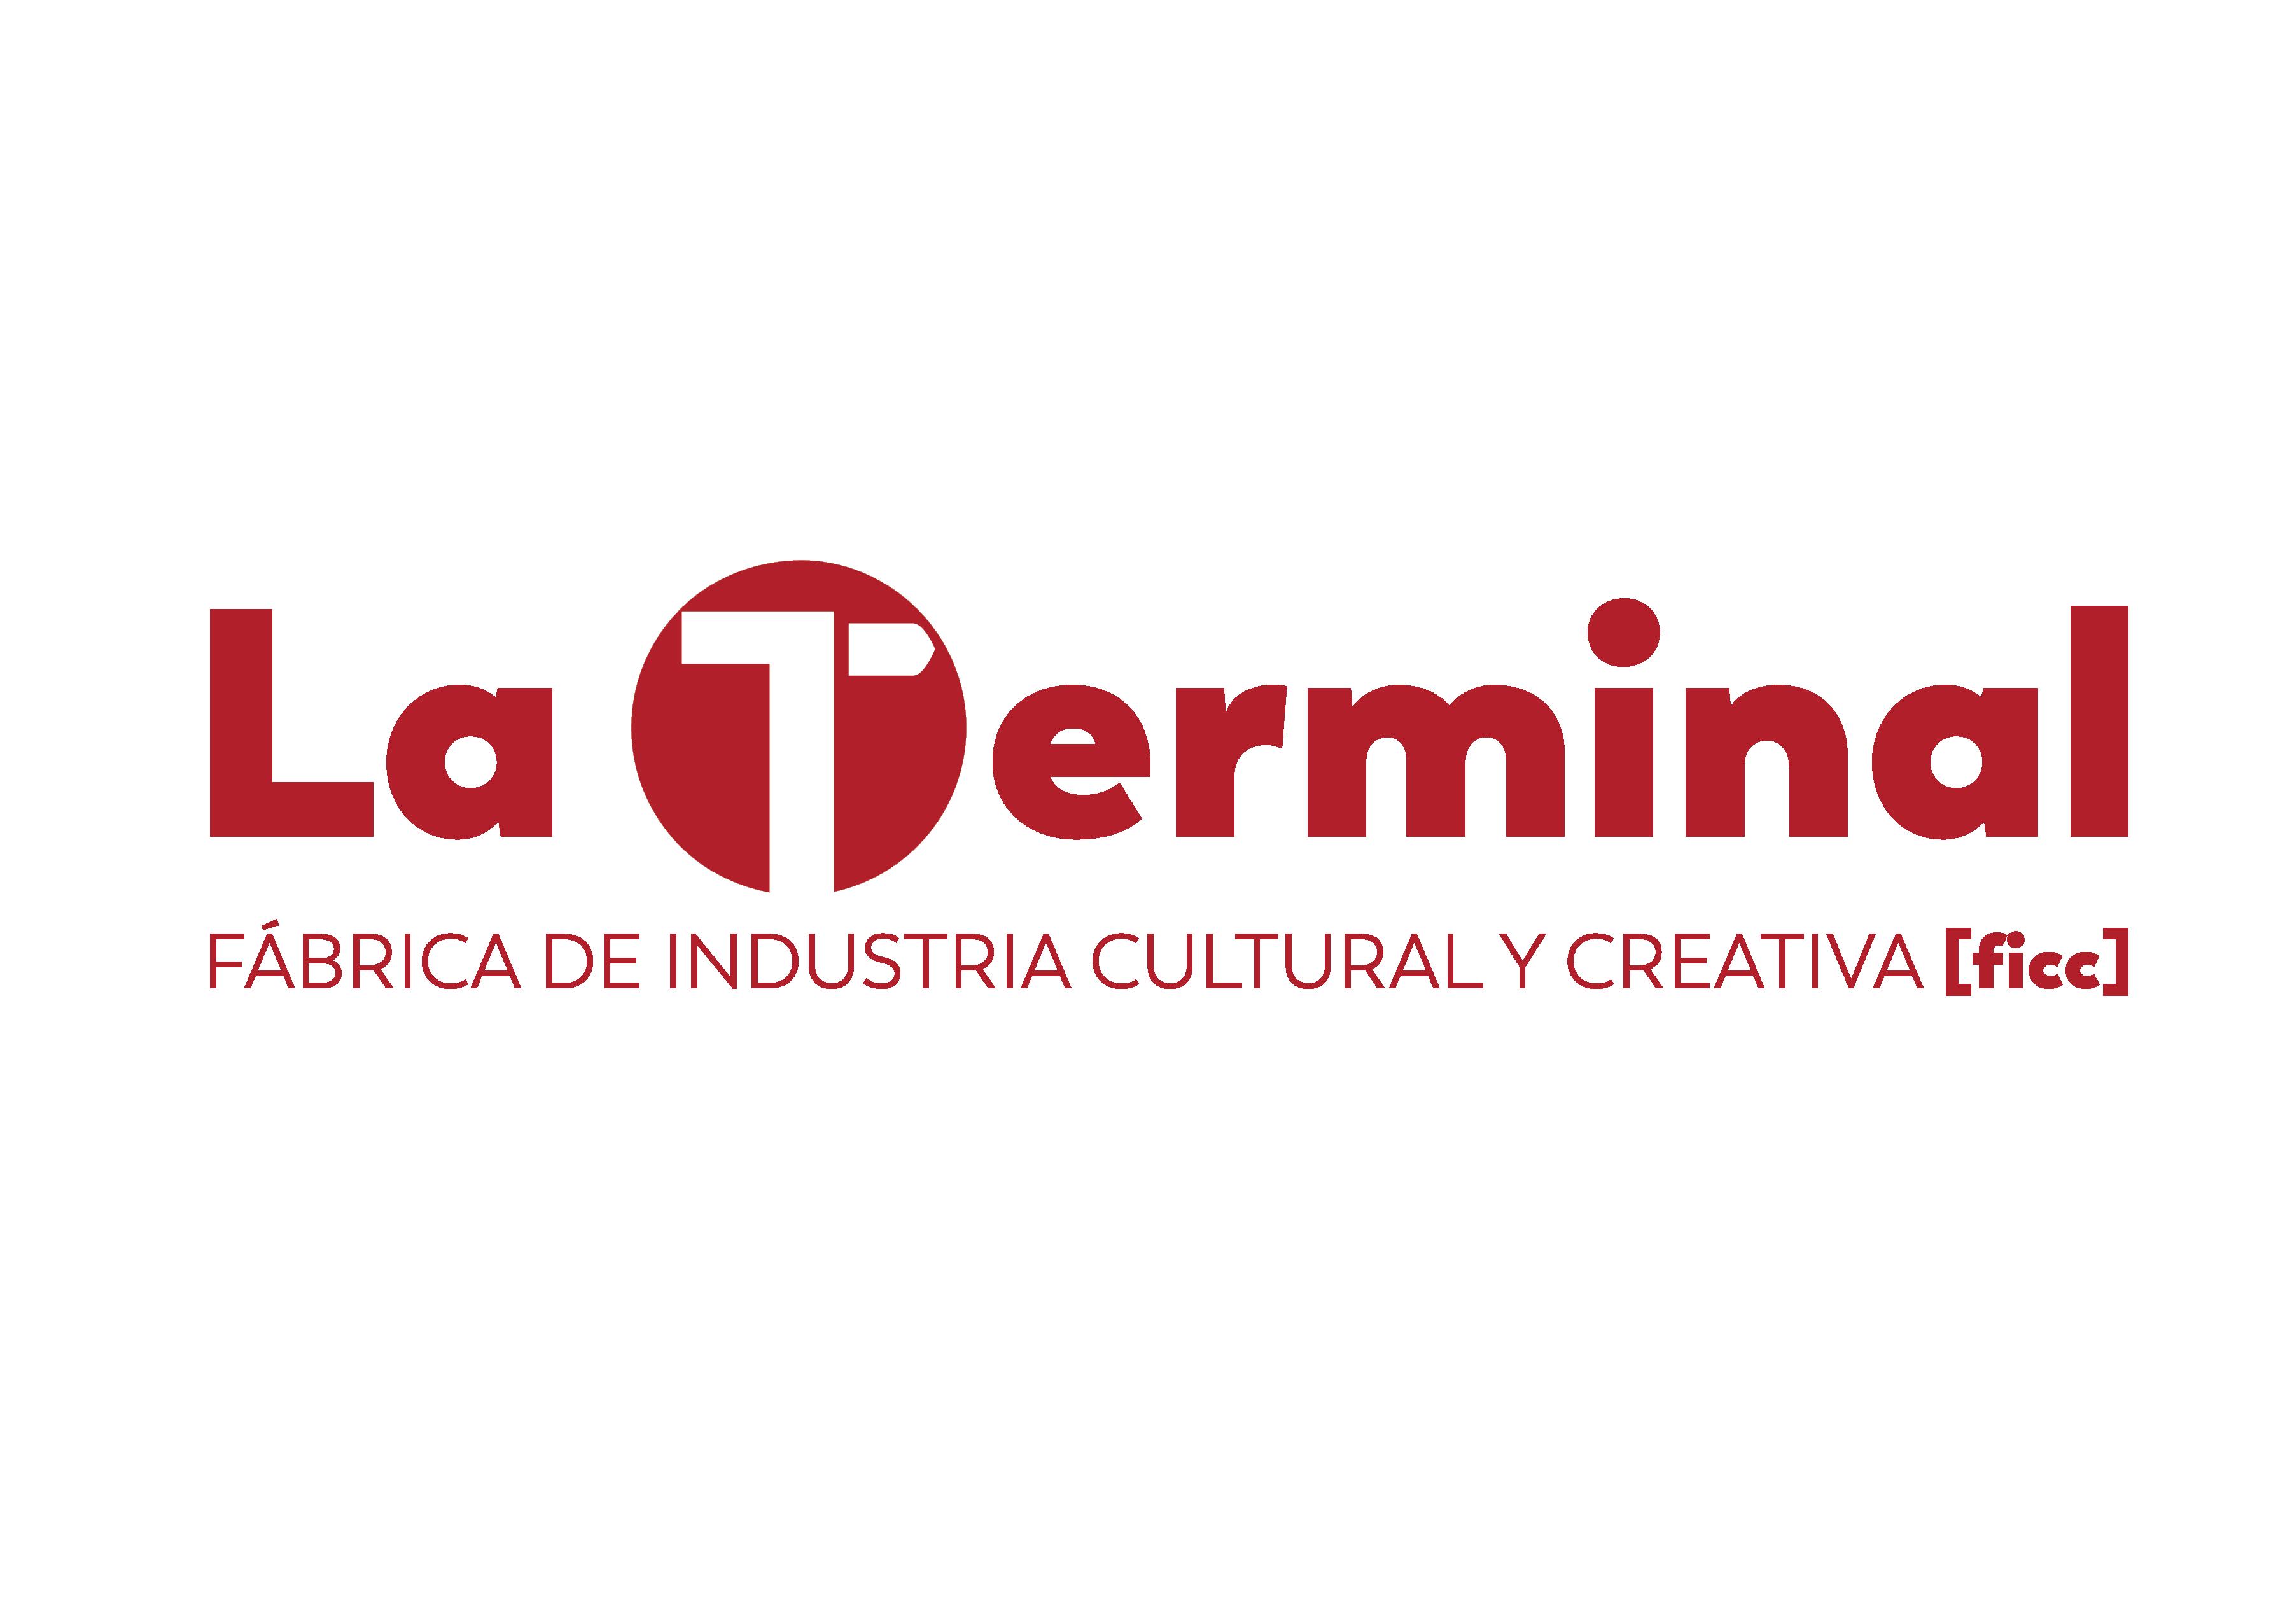 logo Terminal horizontal